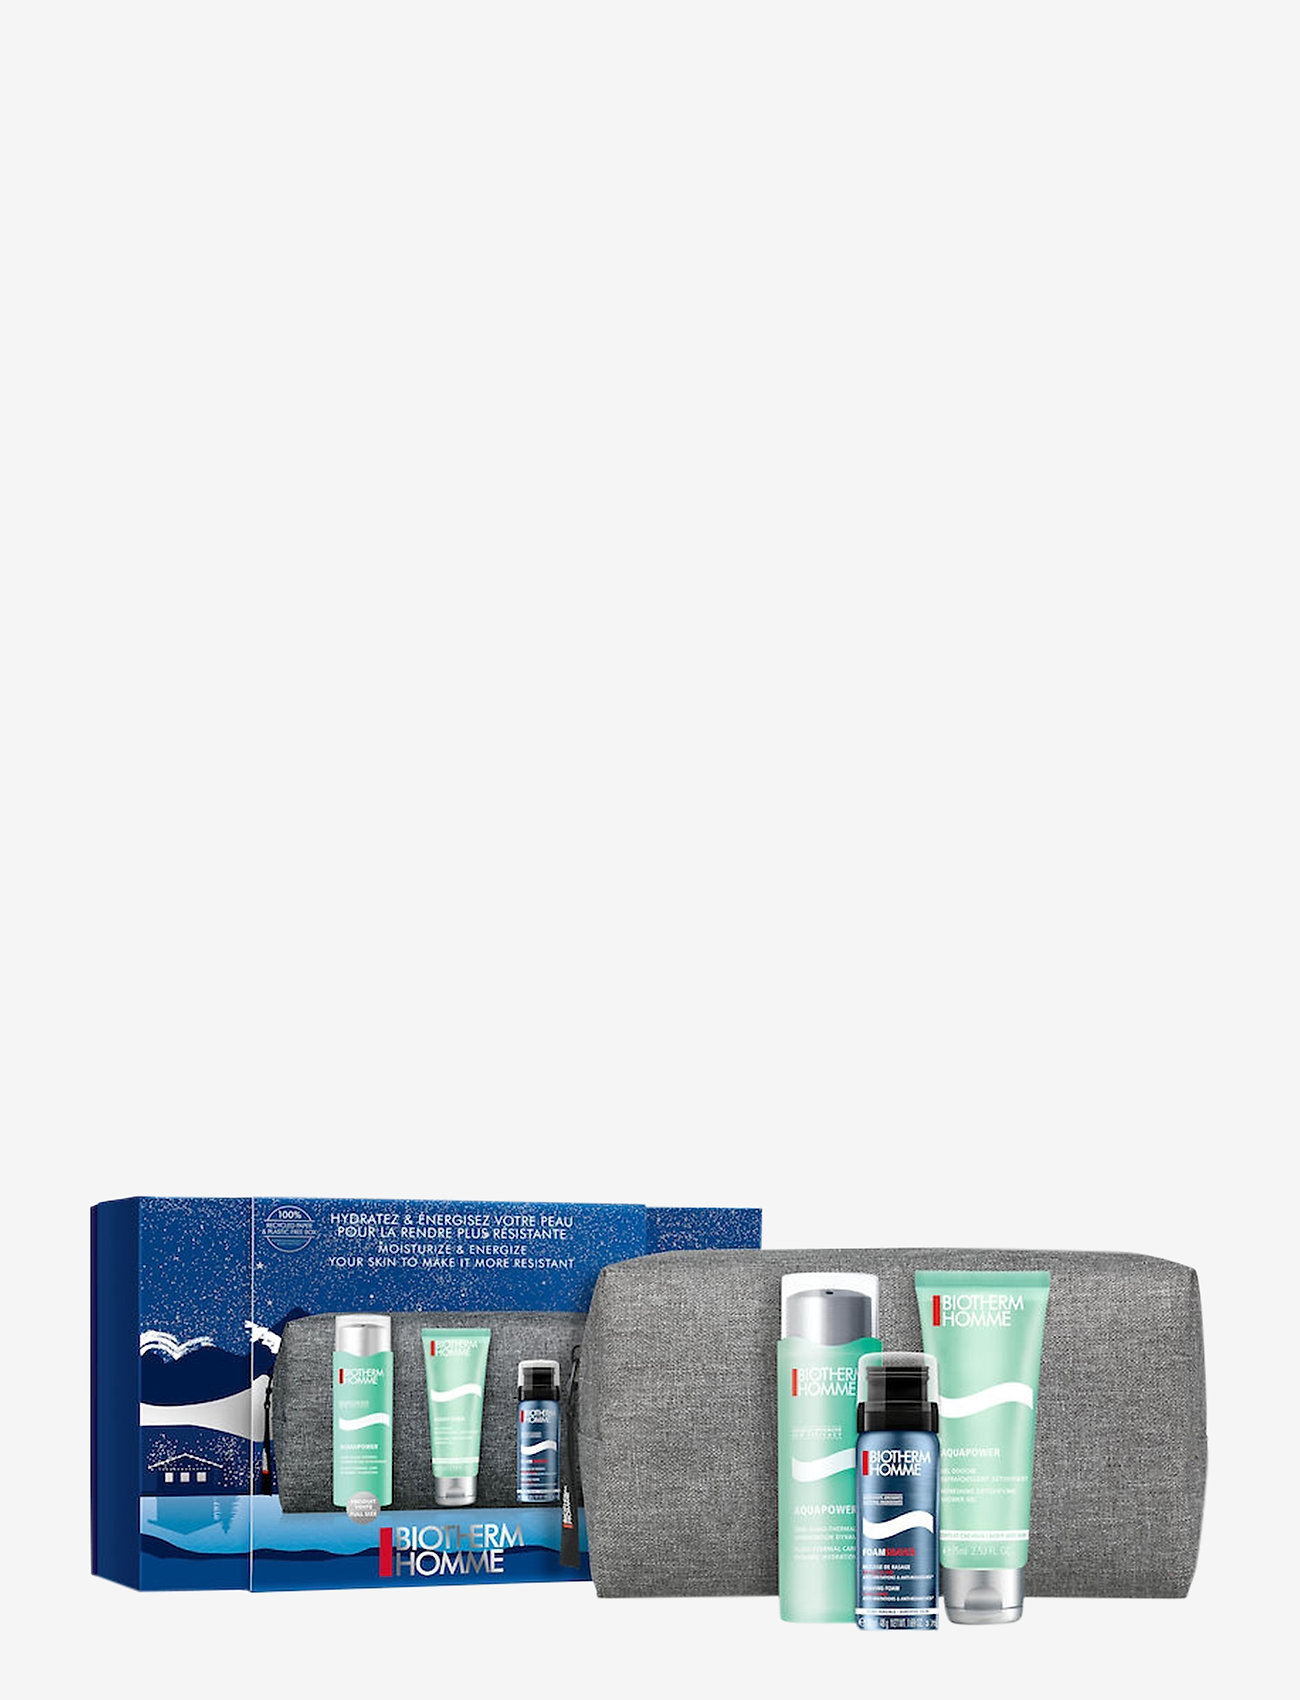 Biotherm - Homme Aquapower Christmas Set 2020 - giveaways - no colour - 0